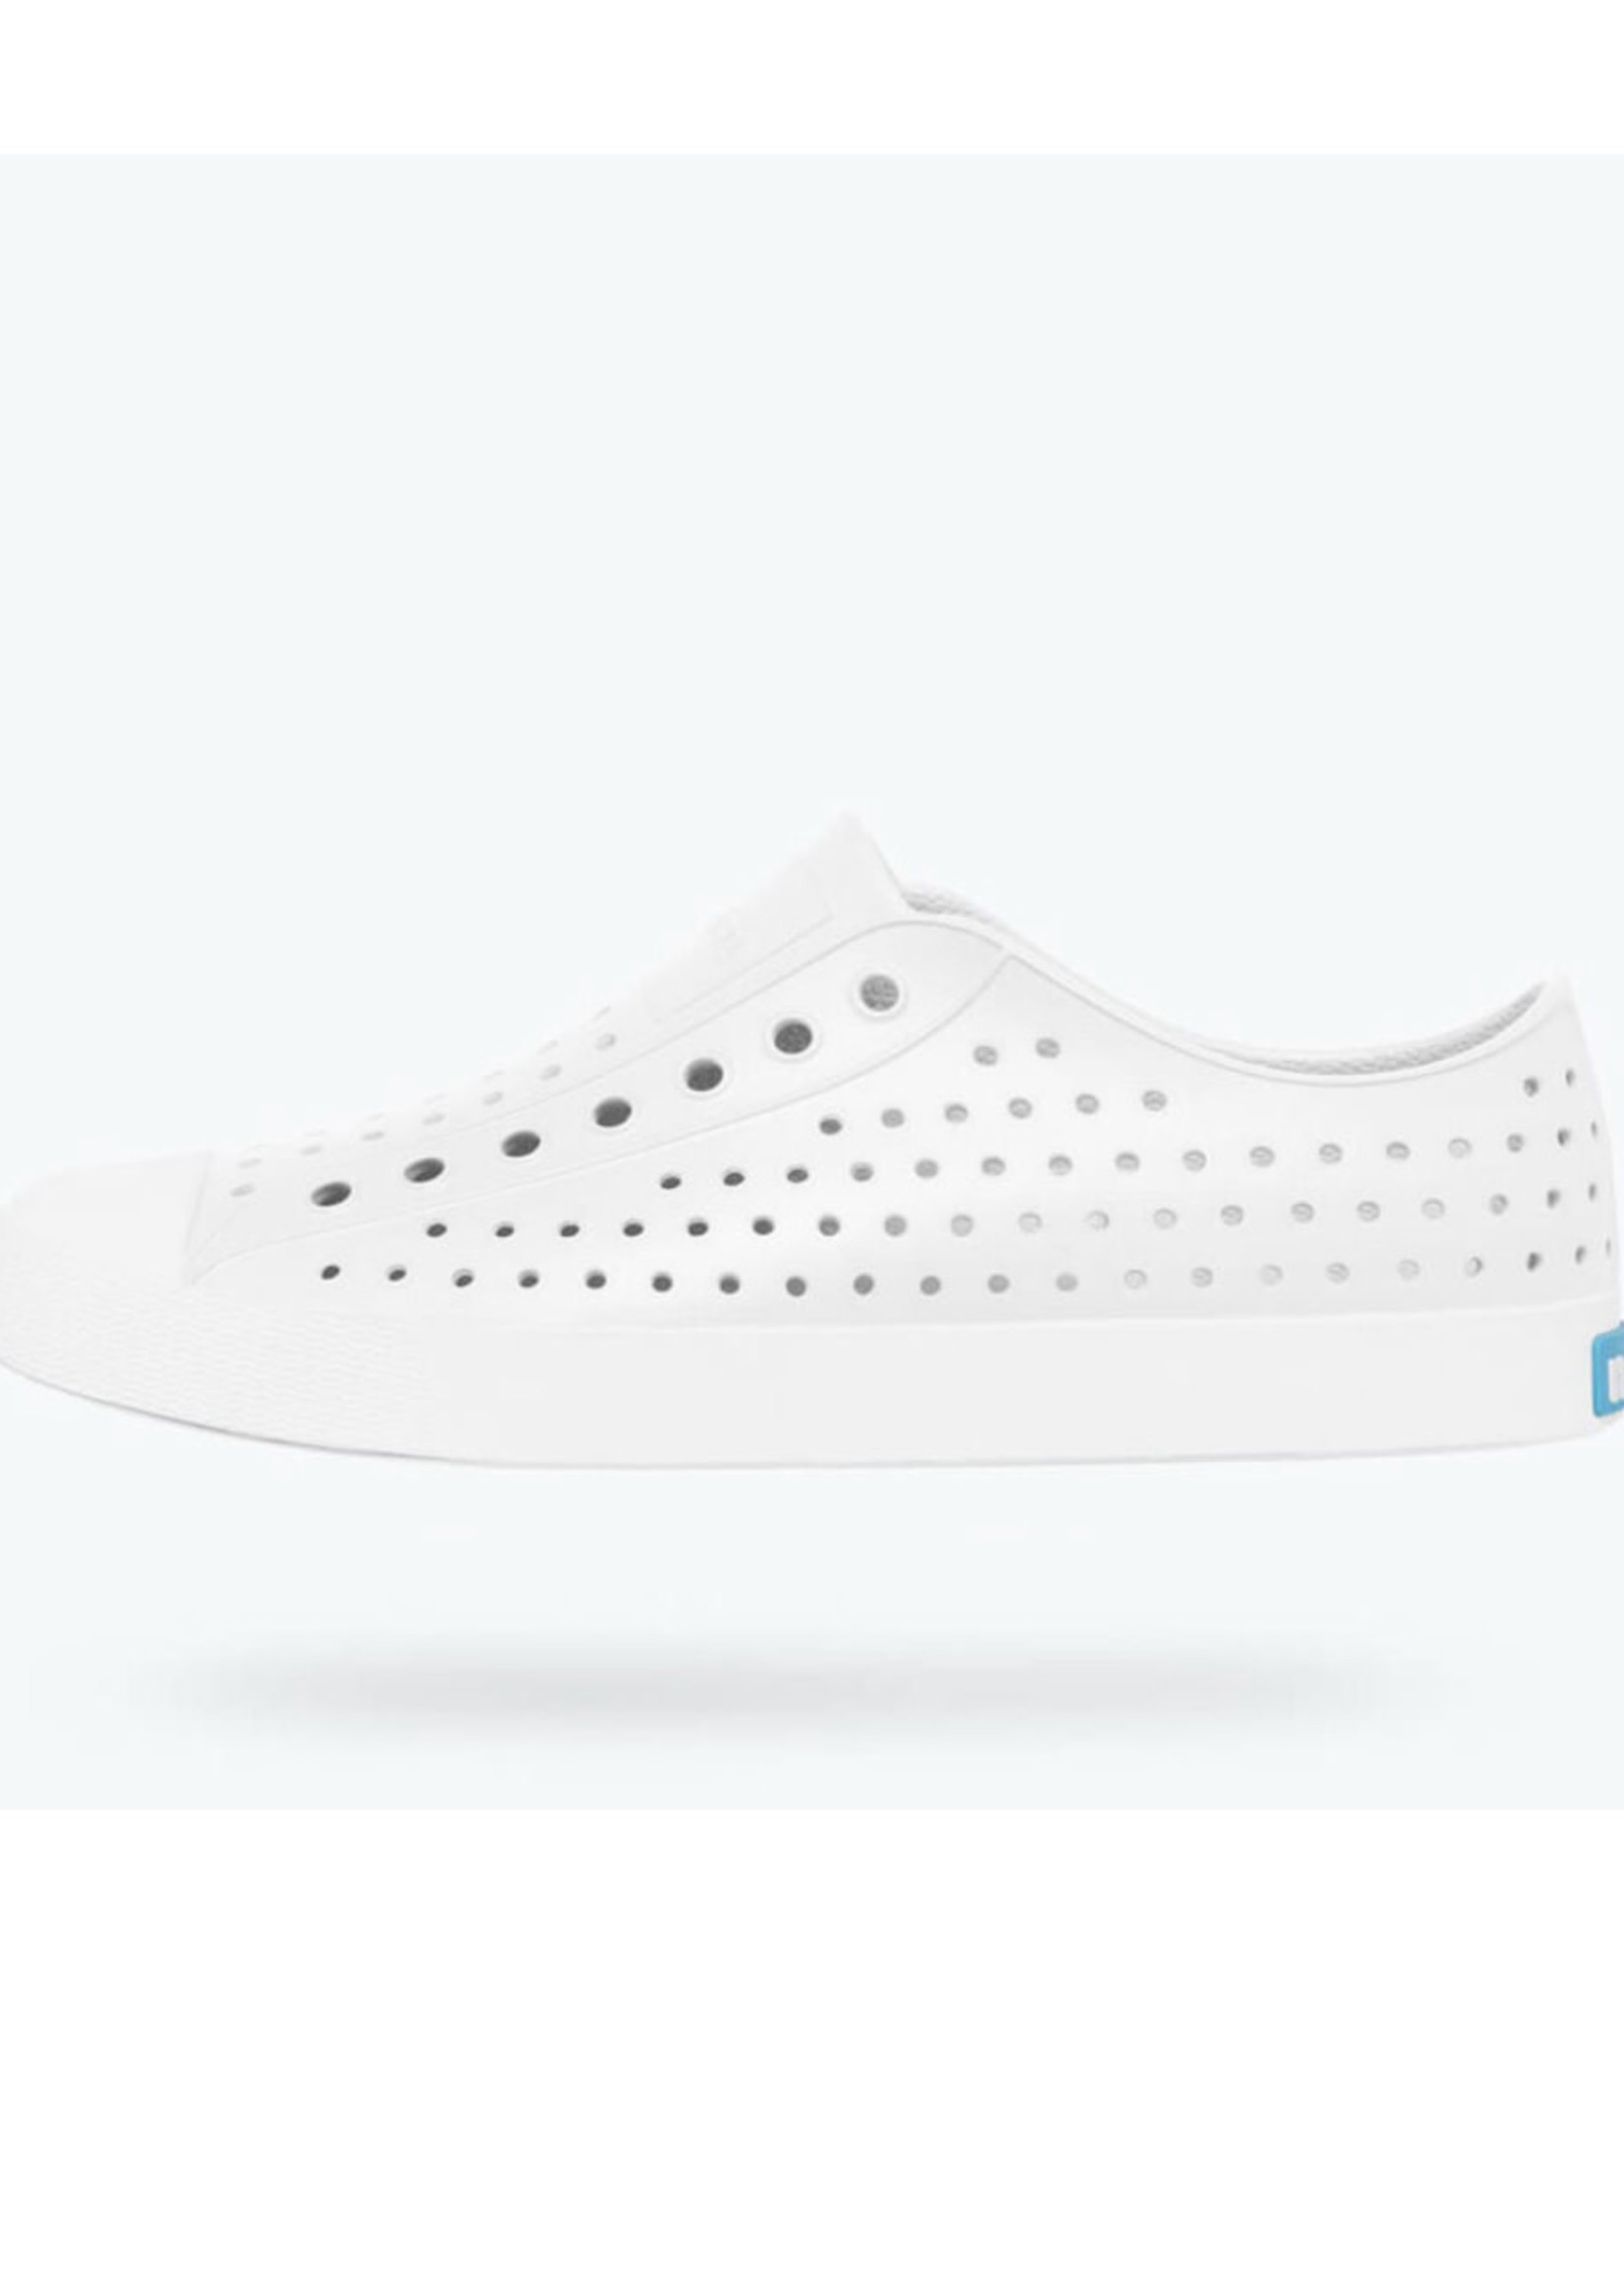 NATIVE shoes JEFFERSON, White, Unisex